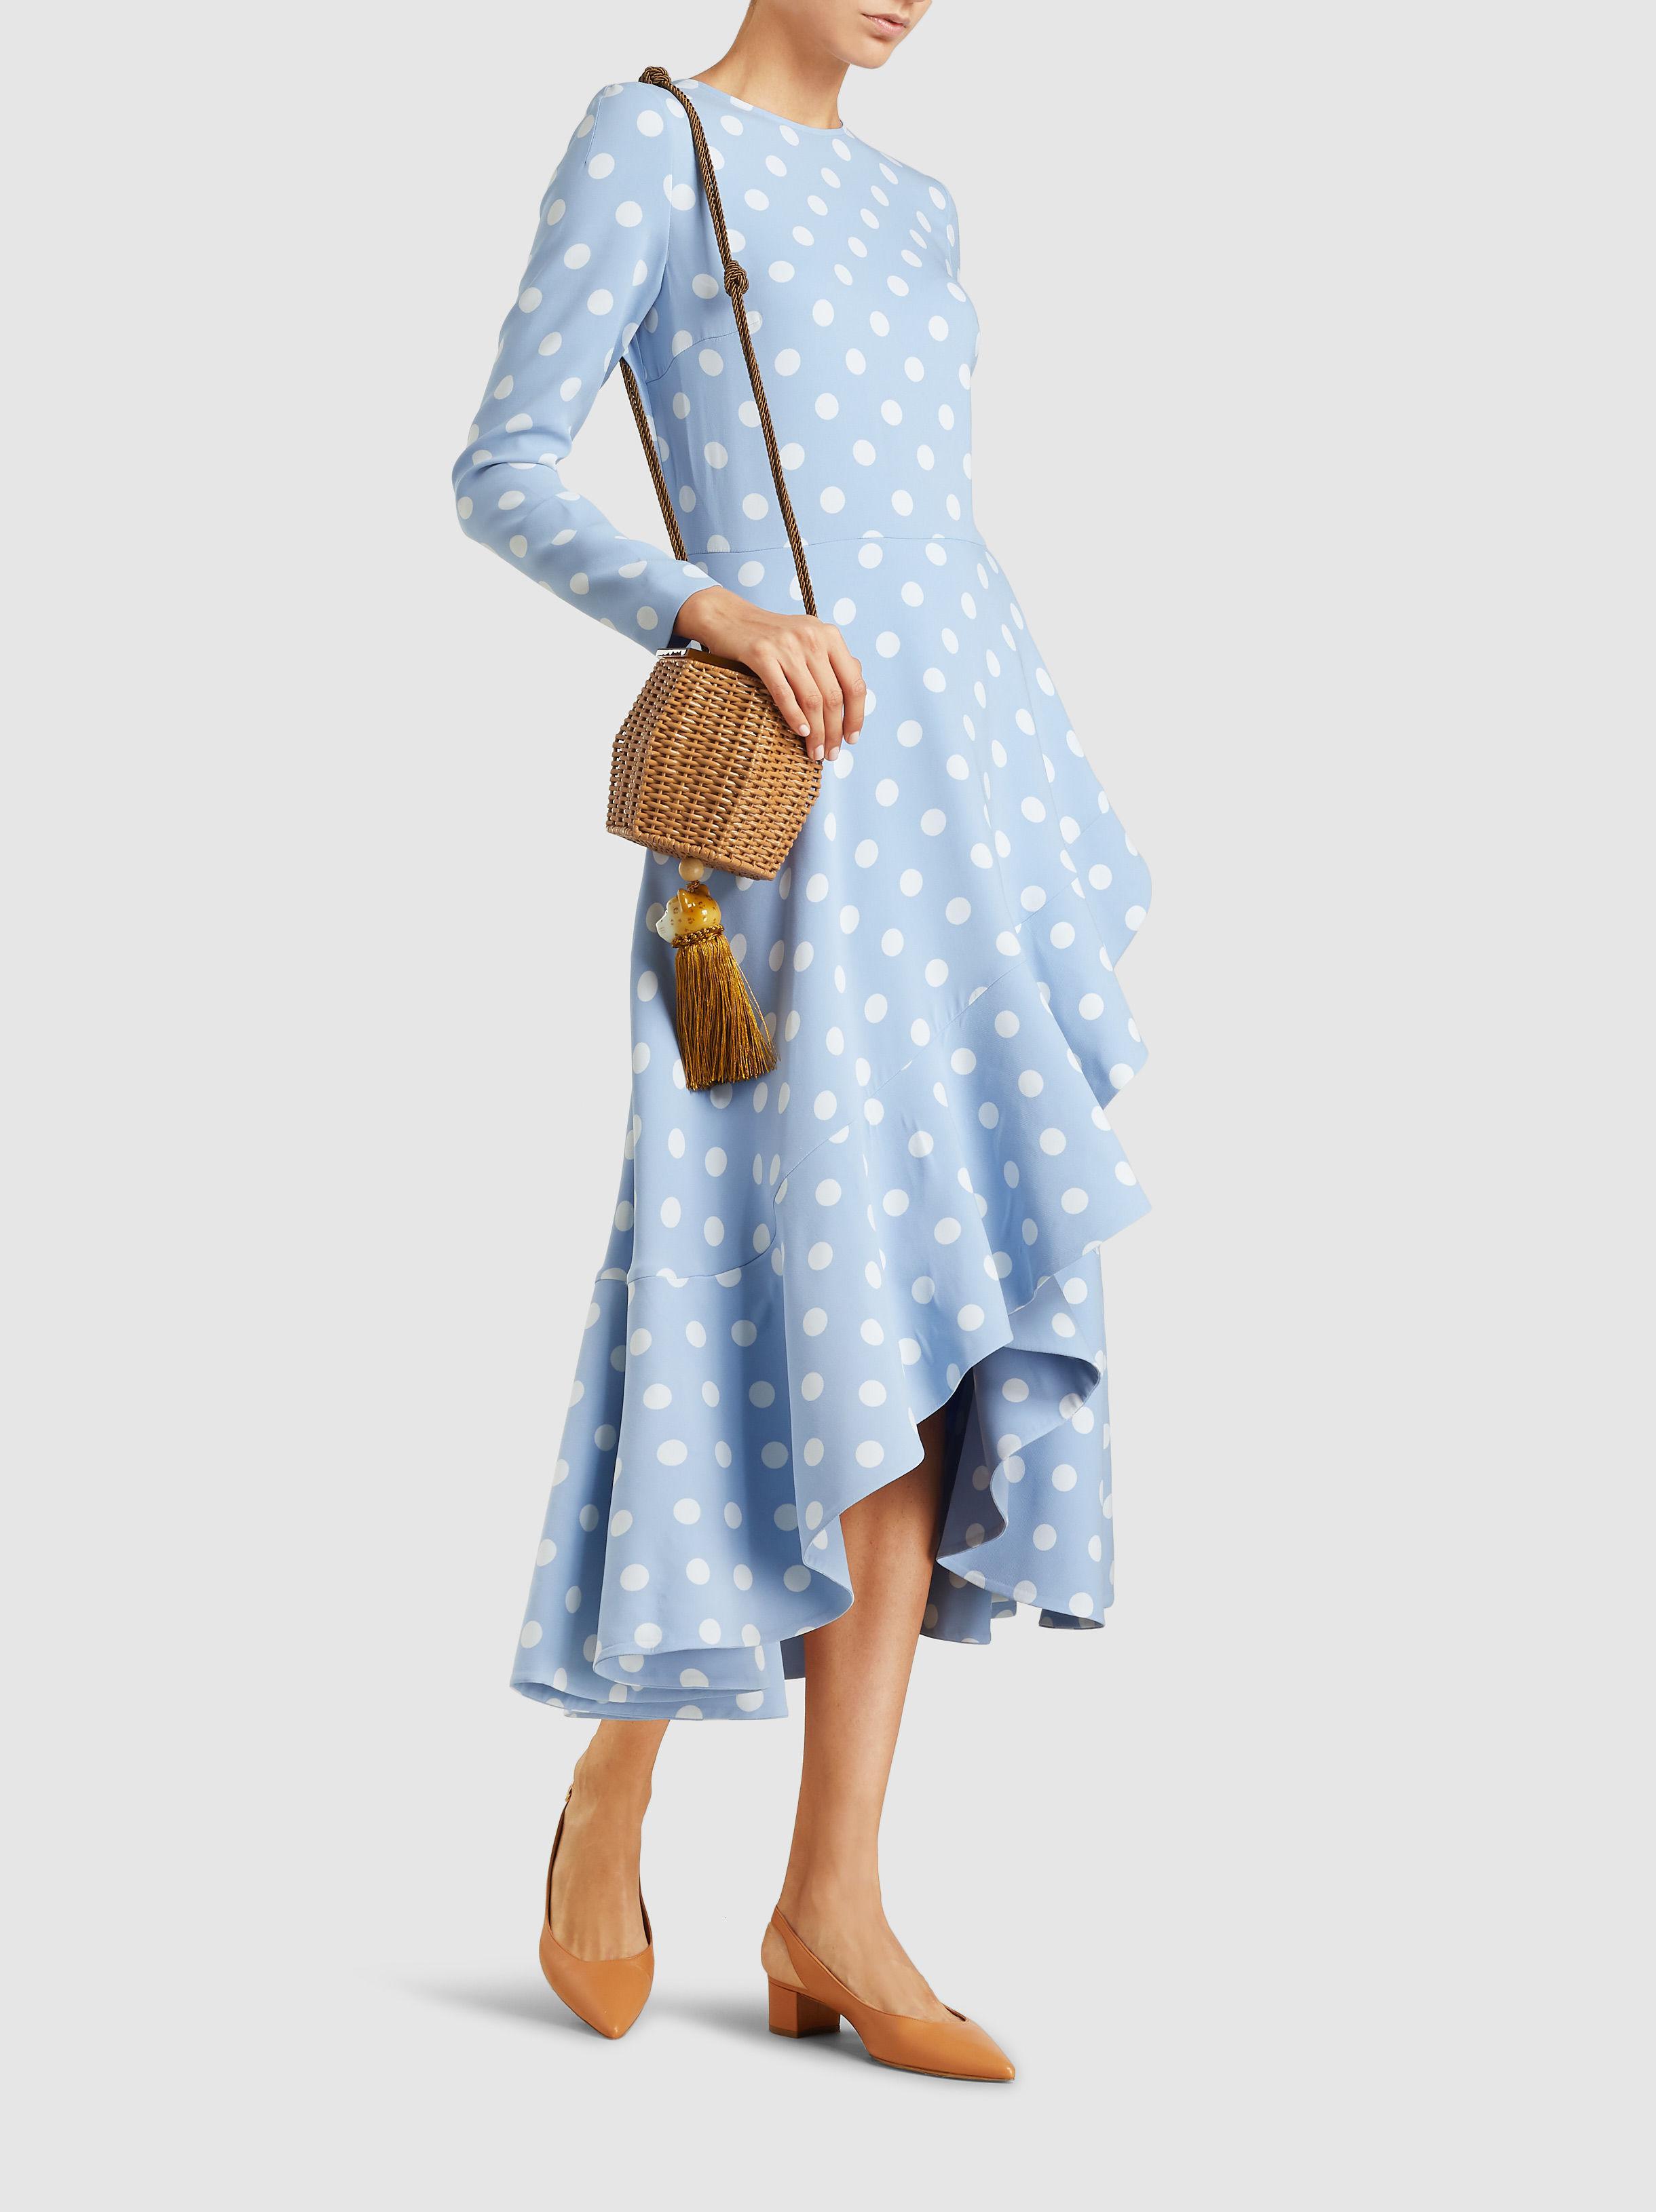 88bafd0e3ef157 Oscar de la Renta - Blue Polka Dot Dress - Lyst. View fullscreen